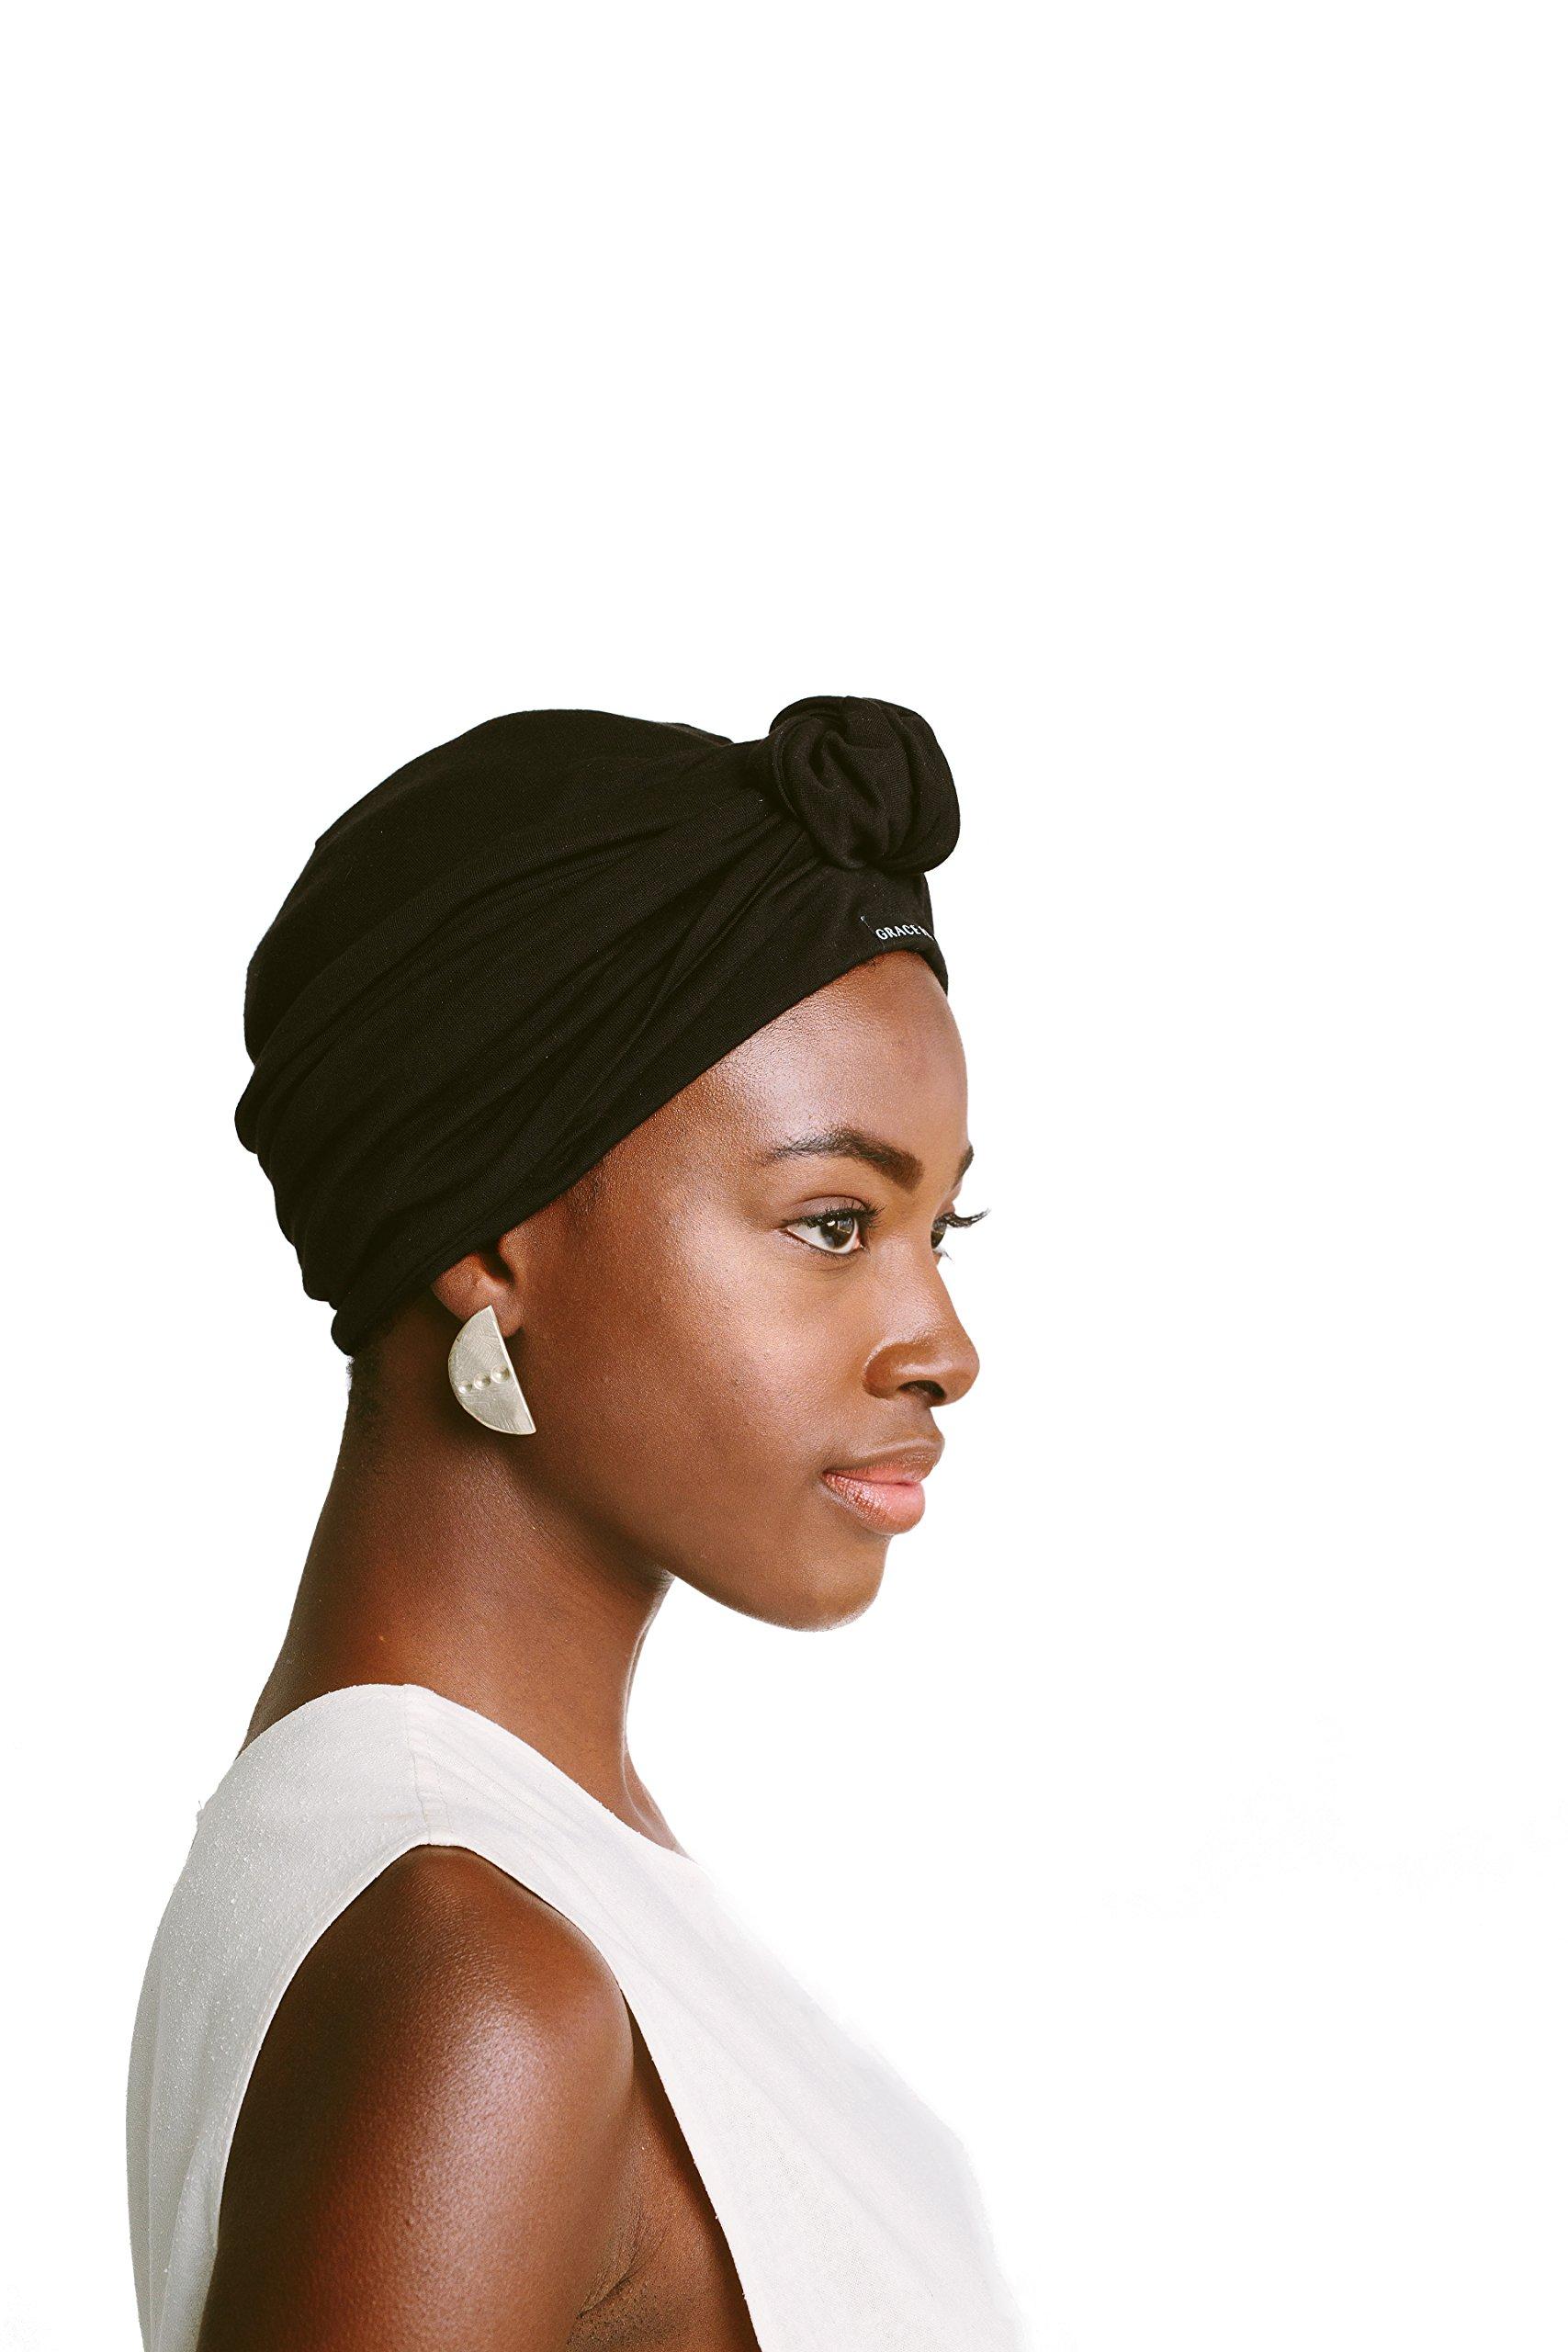 Grace Eleyae Knot Turban, Satin-Lined Hair Care Headwear [Day & Night] Black by Grace Eleyae